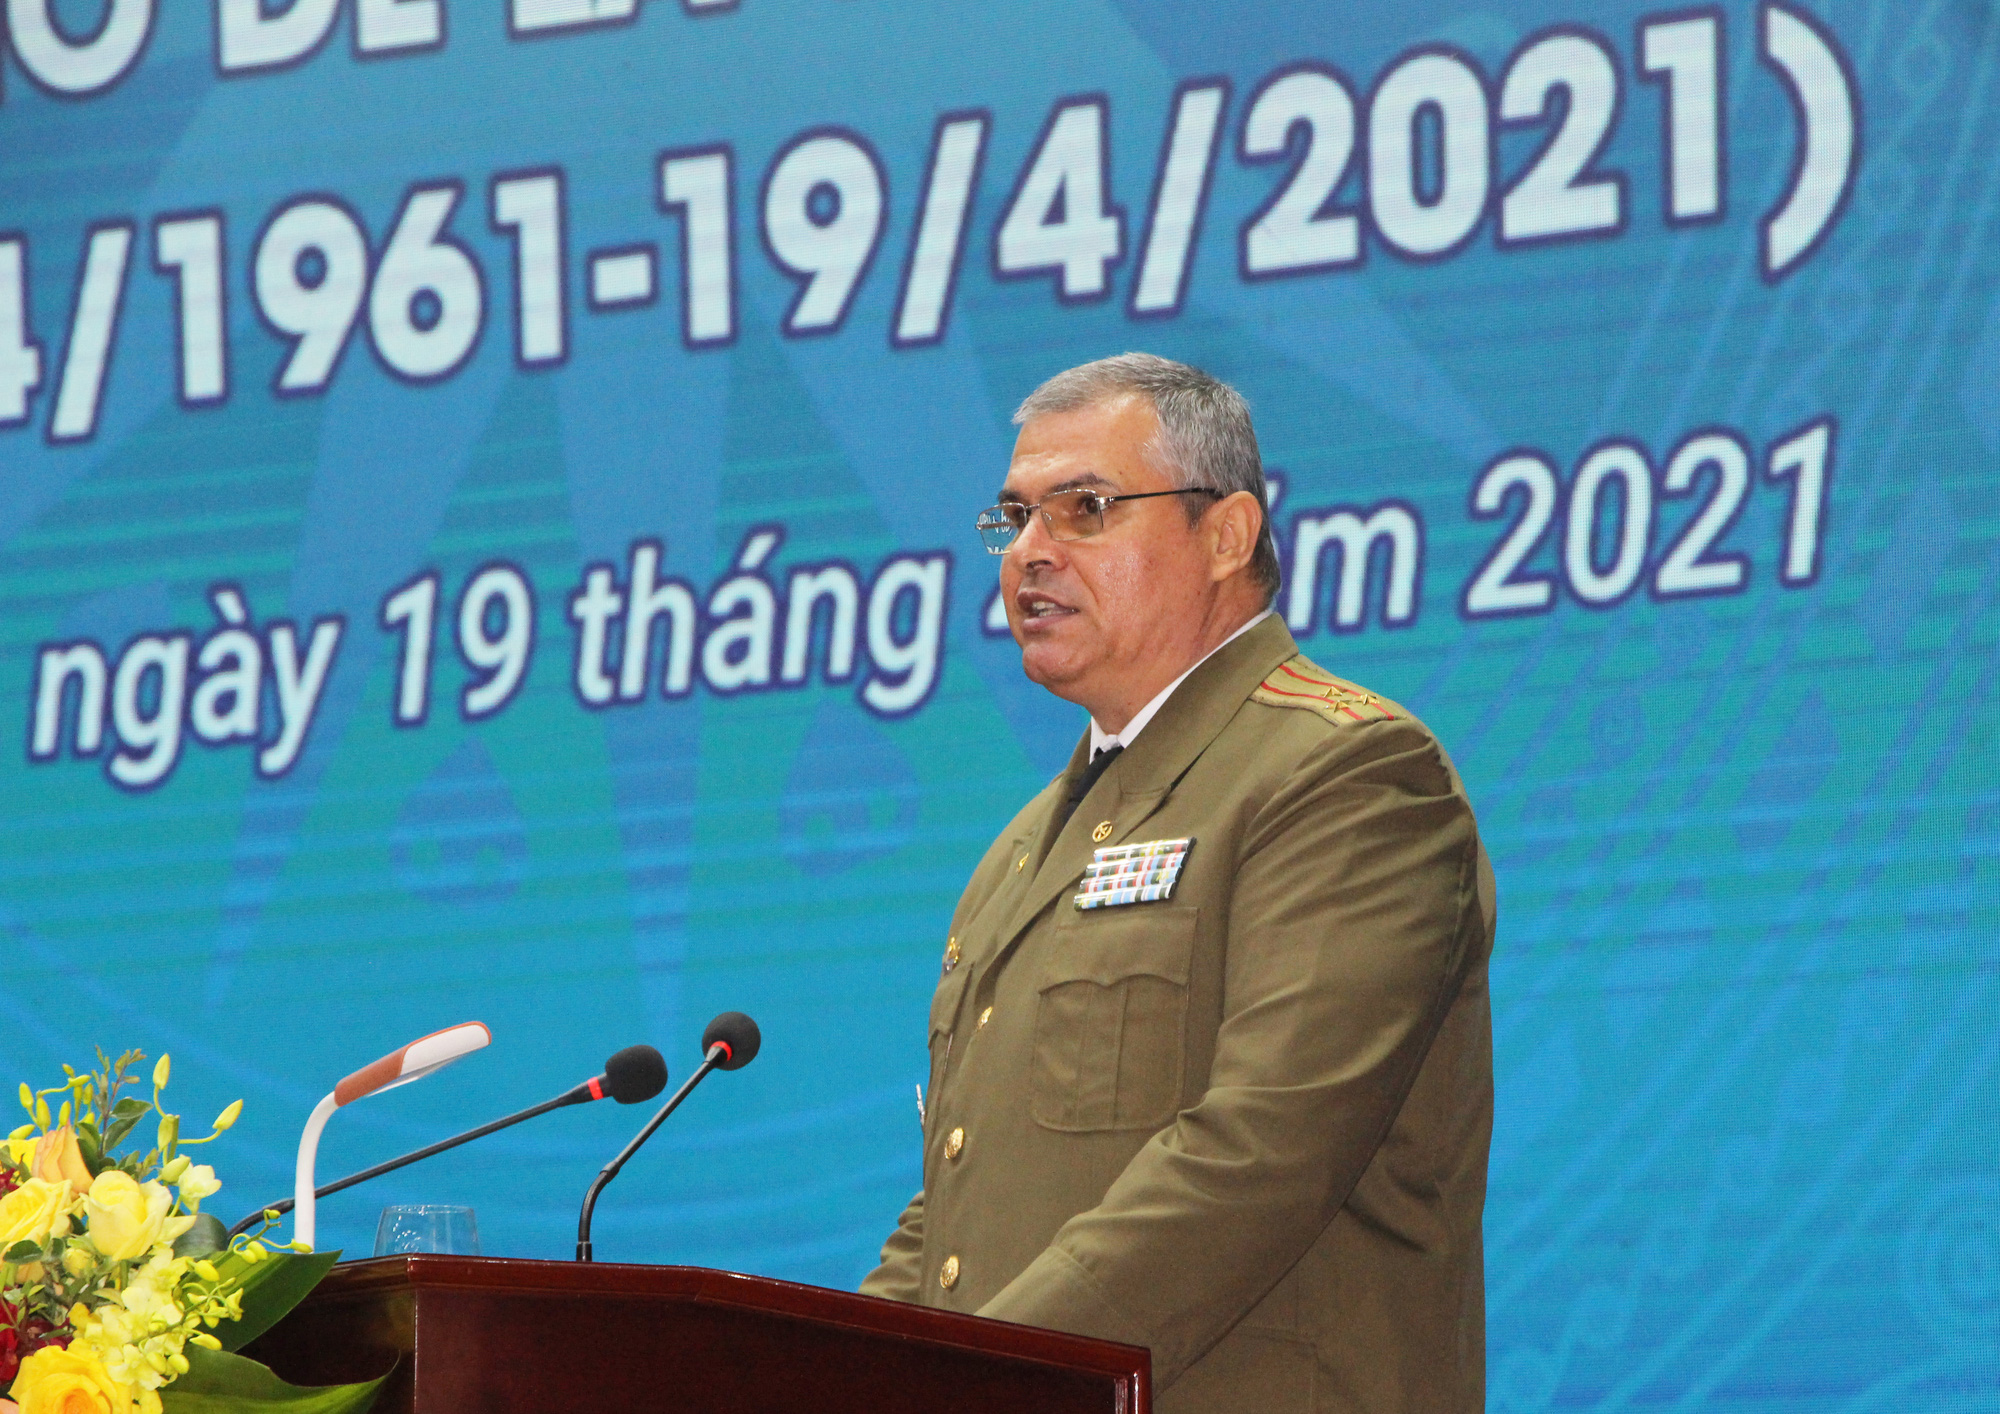 Colonel Juan Miguel García Montano, a Cuban military attaché, speaks at the ceremony to celebrate the 60th anniversary of Cuba's Girón victory in Hanoi, April 19, 2021. Photo: H.Q. / Tuoi Tre